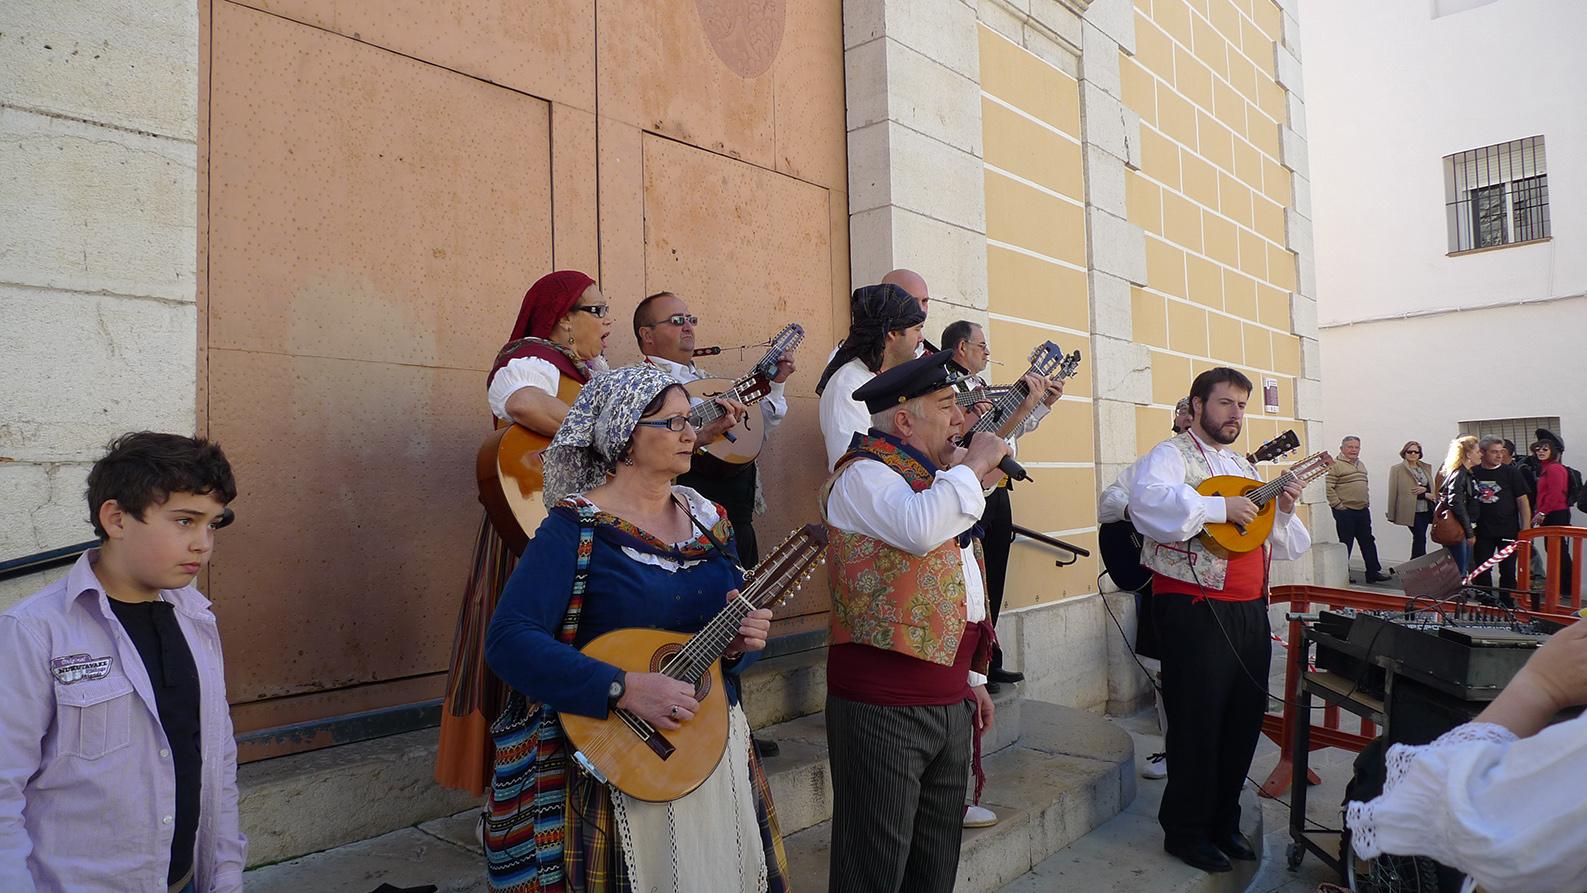 2014-02-23 - Baladre a Fira St. Marcia-ROTOVA (48)